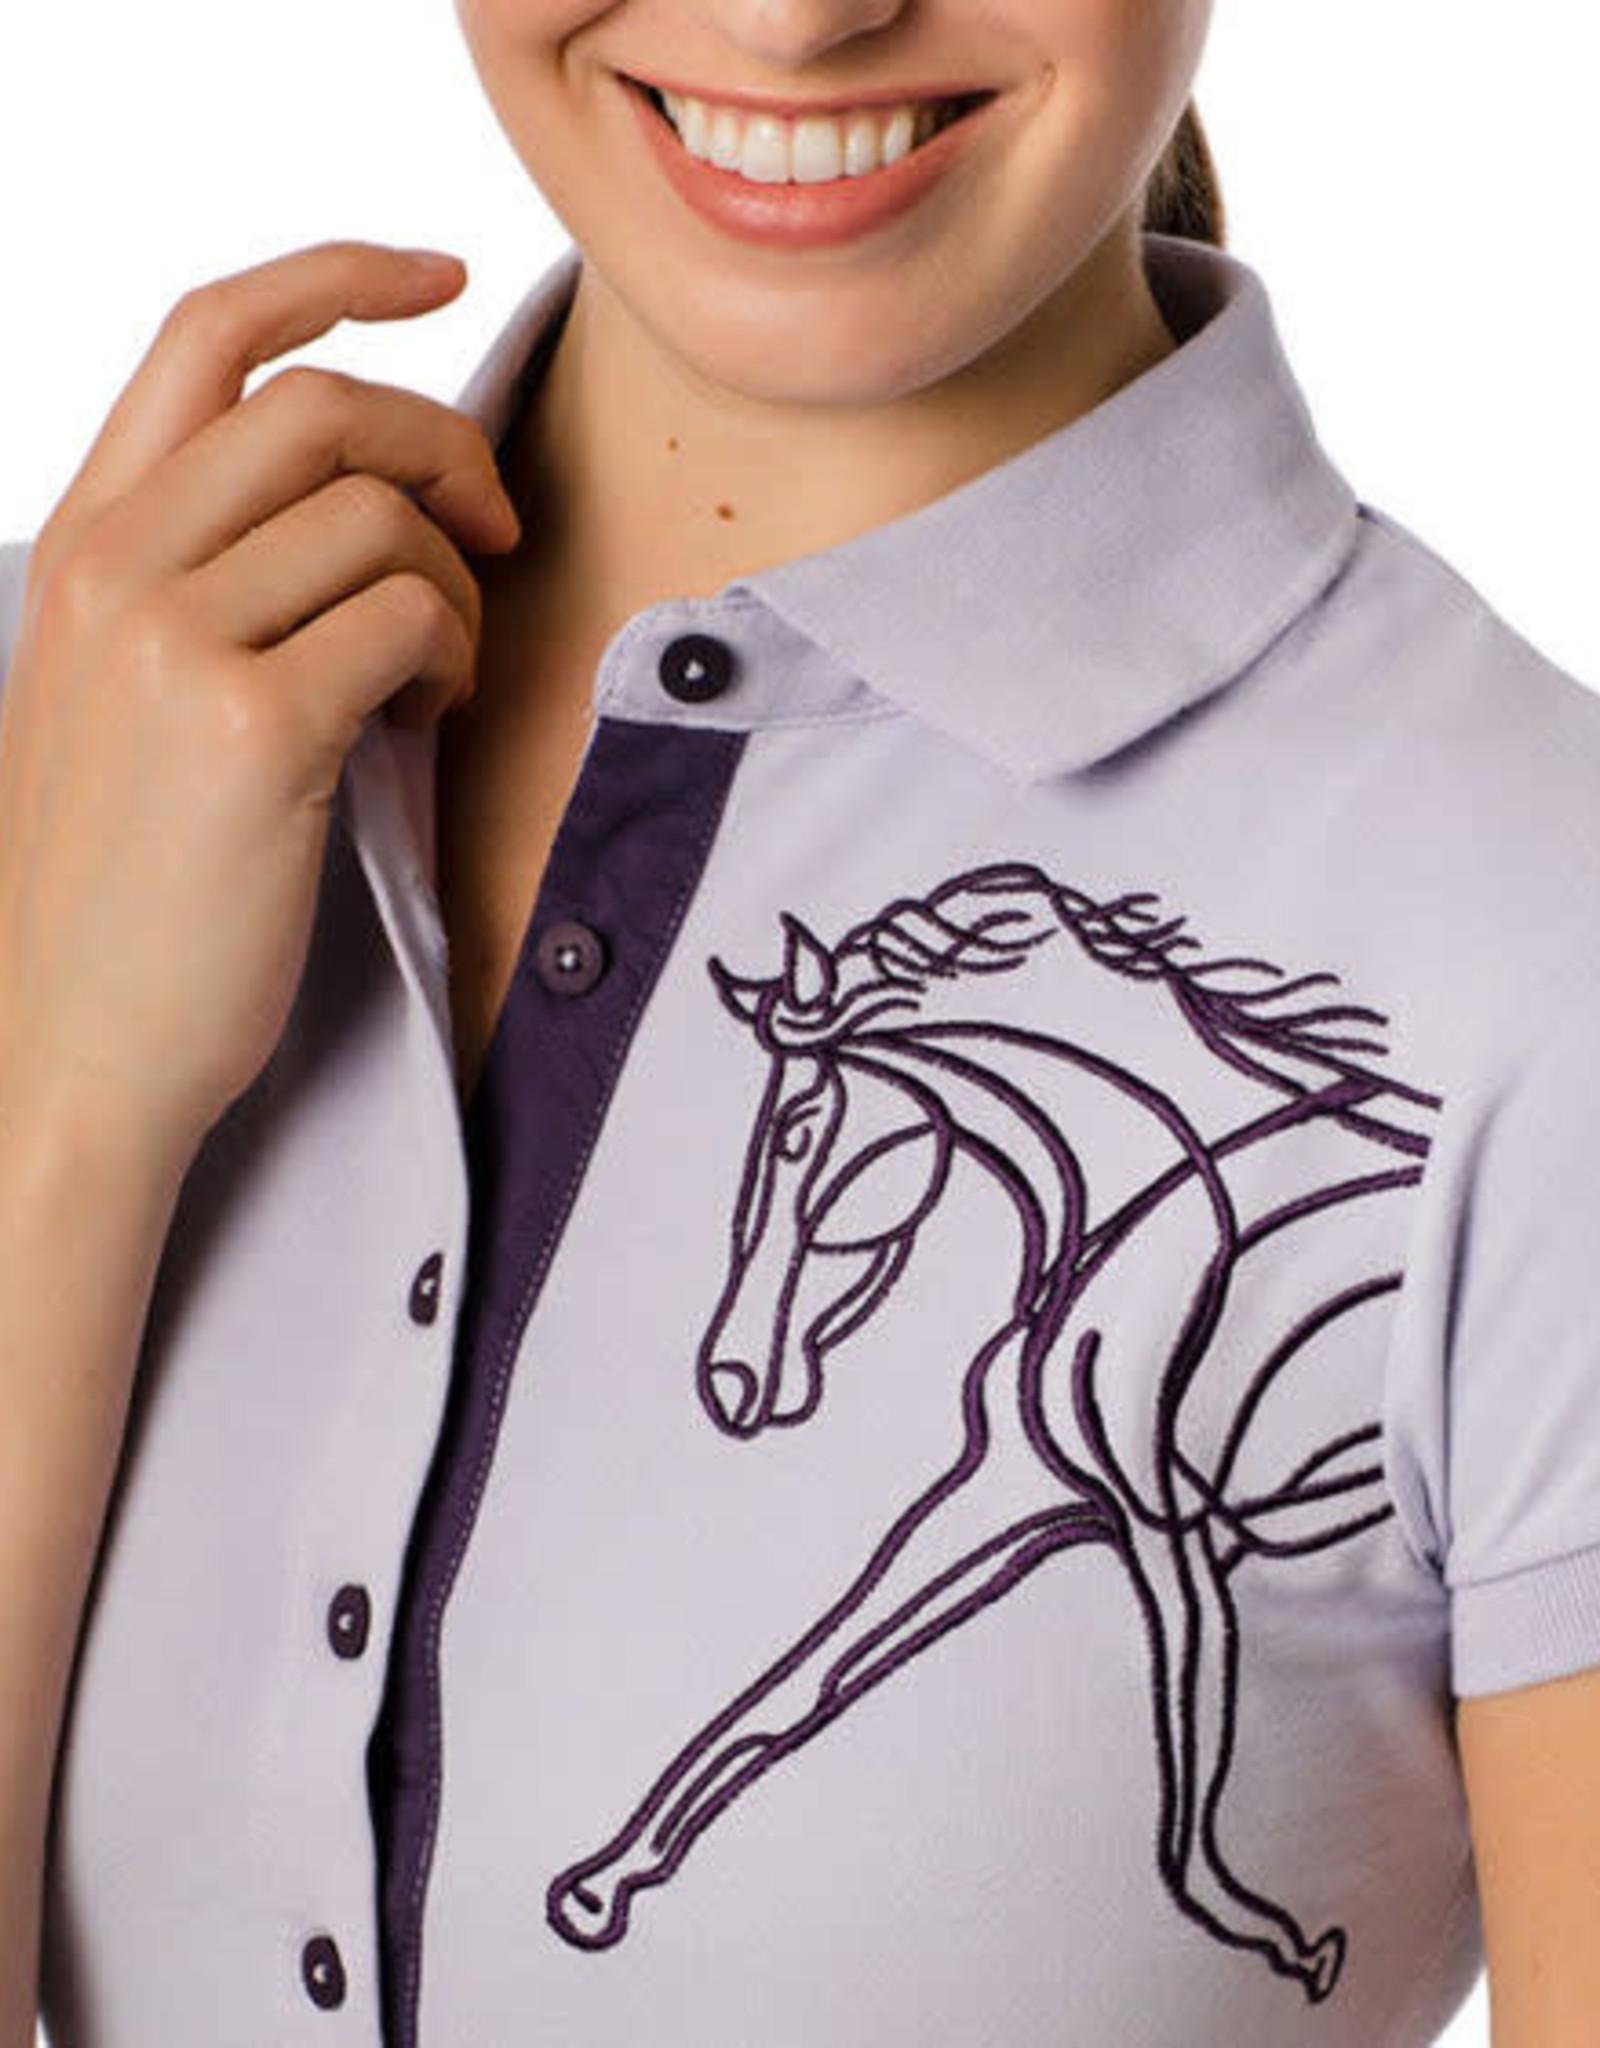 HORSEWARE IRELAND FLAMBORO PIQUE (POLO)